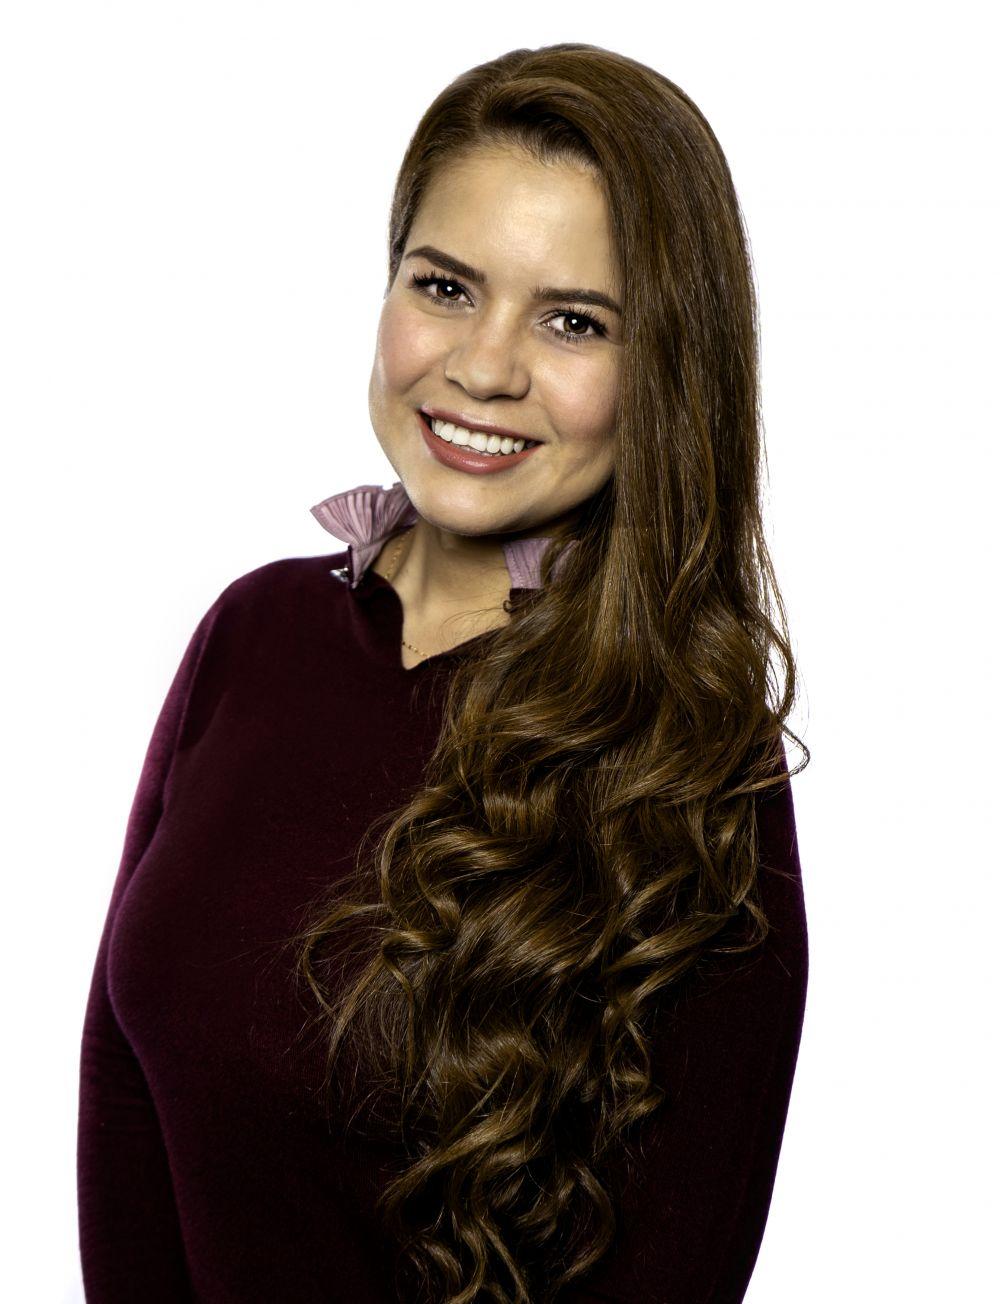 Angela Salazar-Shelton